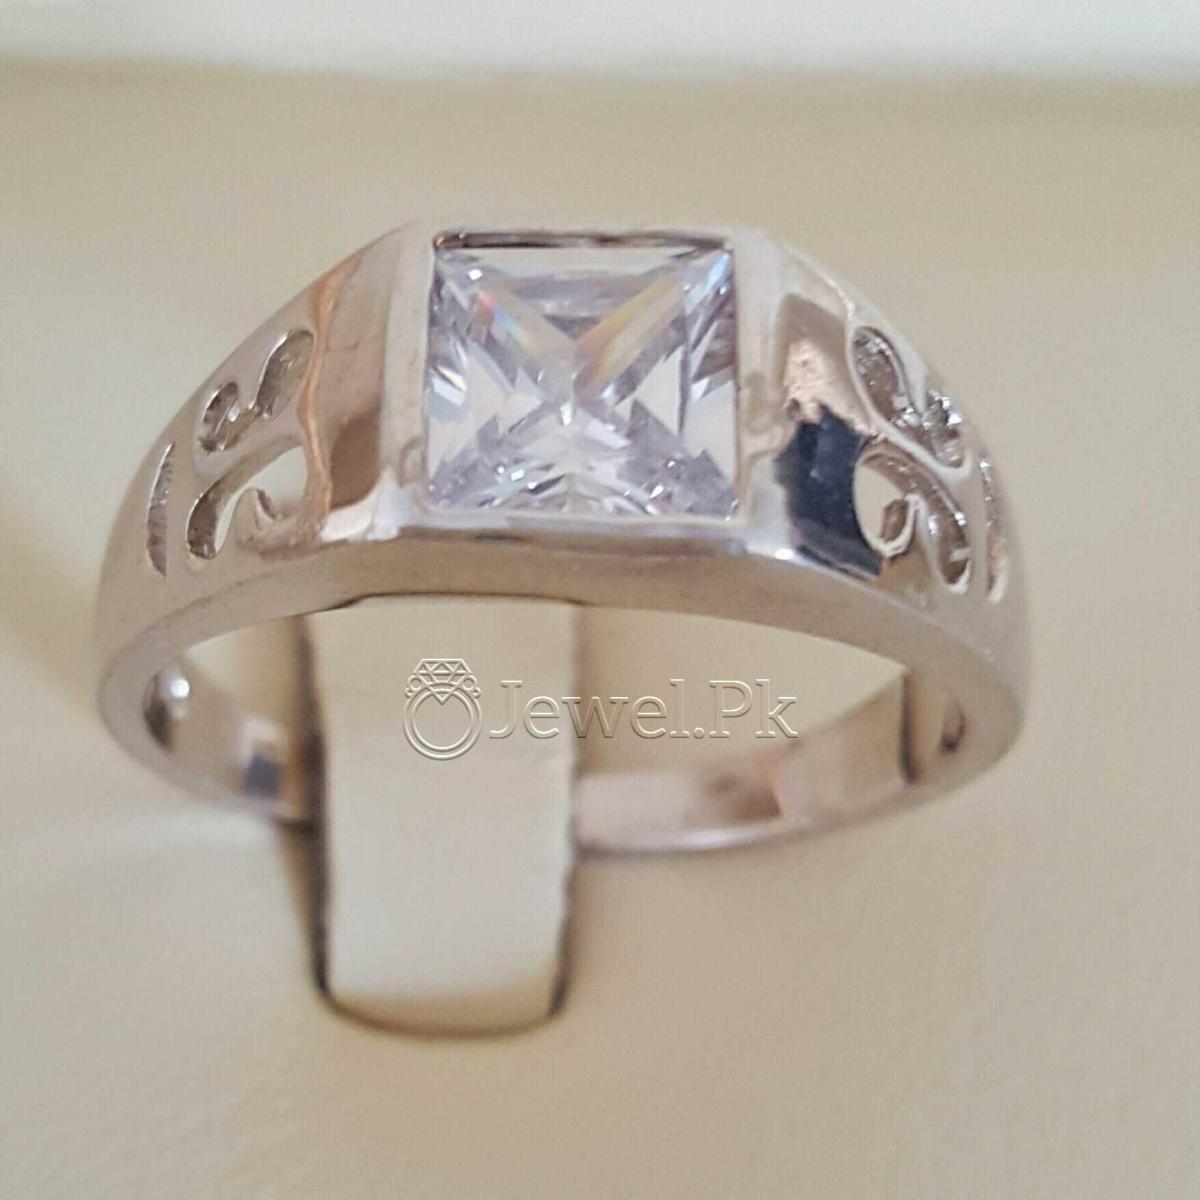 925 Silver Luxury Rings for Ladies Women Silver Rings Woman Handmade Rings 14 natural gemstones pakistan + 925 silver jewelry online